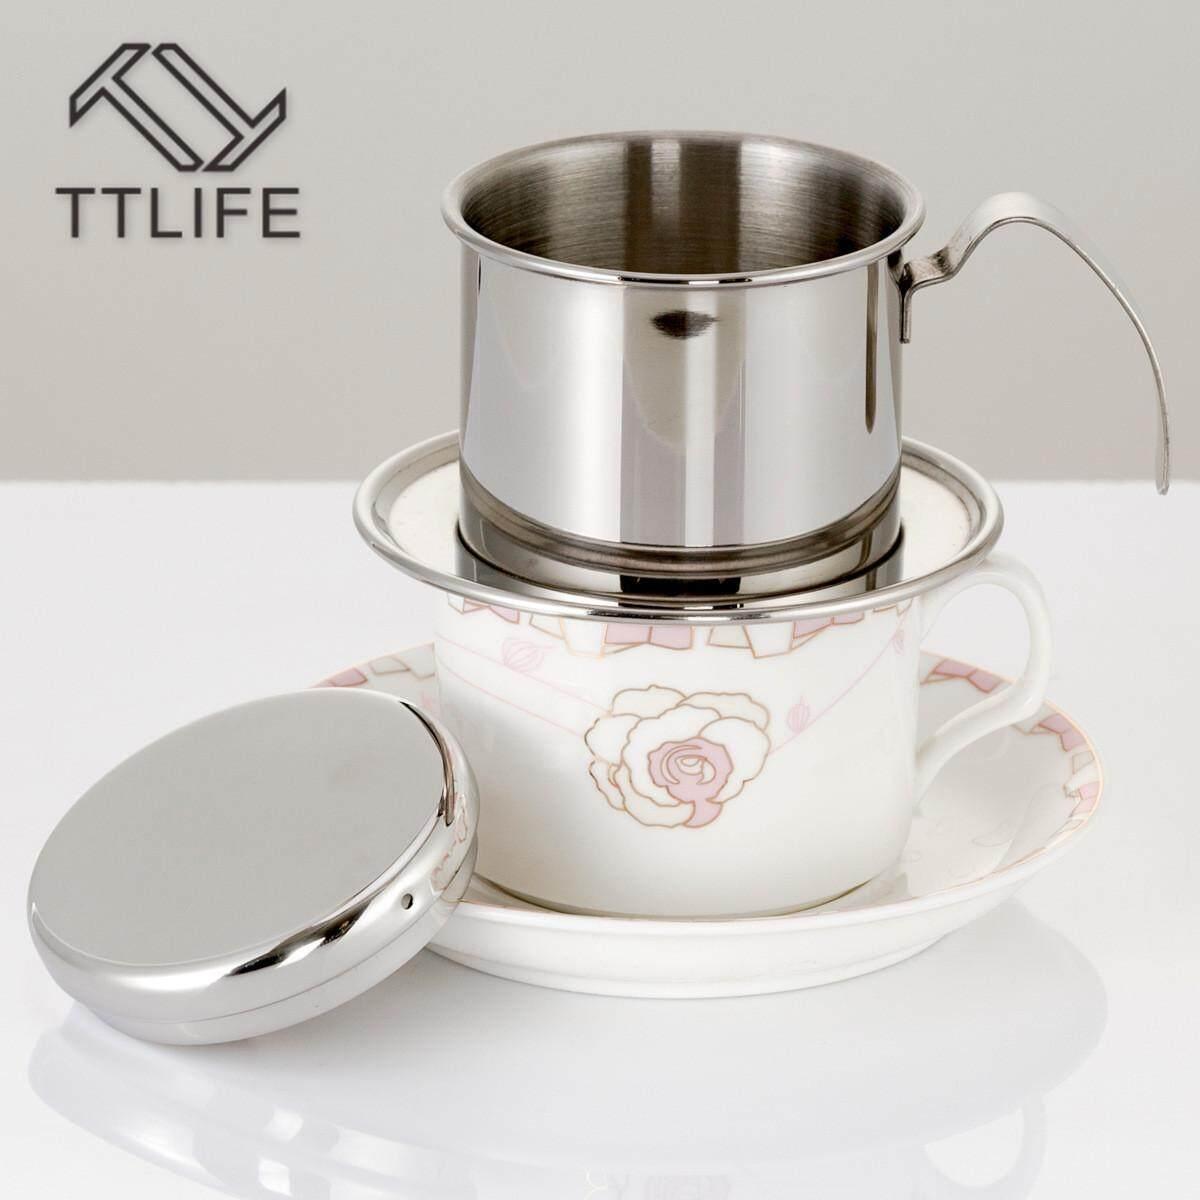 Drip Coffee Maker Biggo Iwaki Water Server 4 Cup Ttlife Pot Vietnamese Household Stainless Steel Brewing